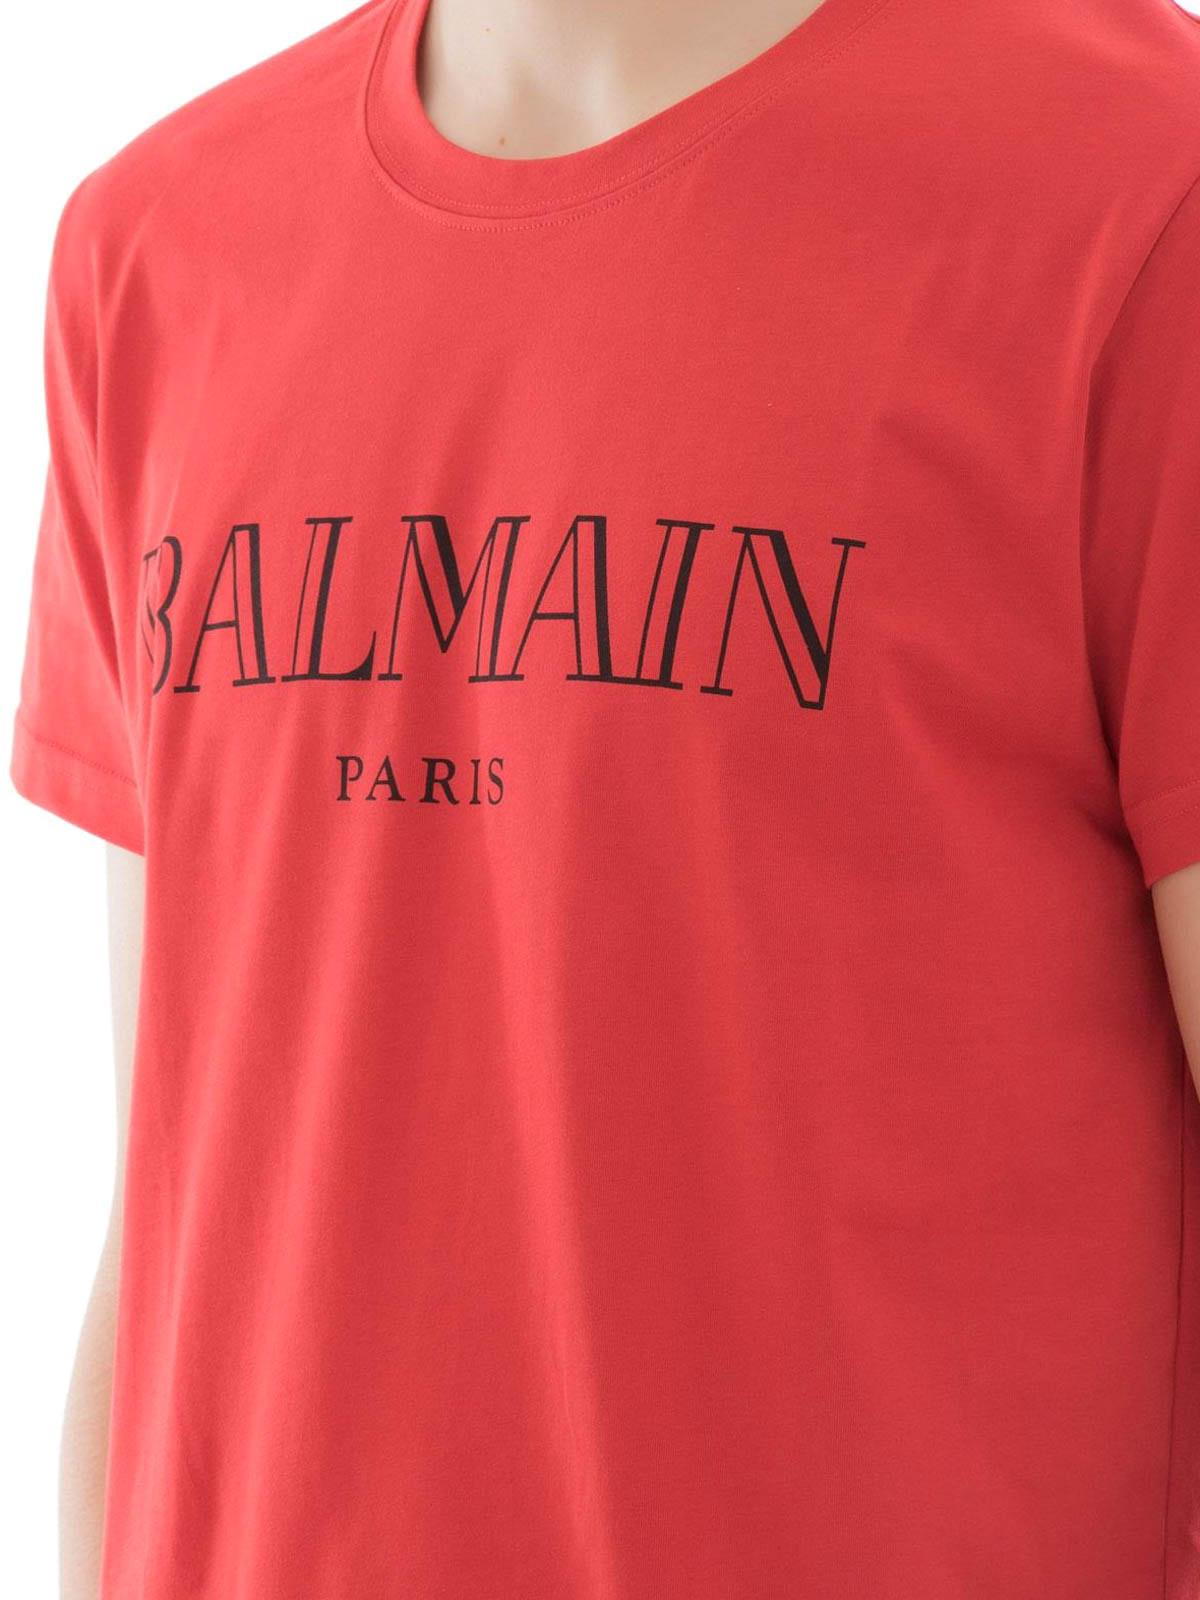 4ae31685d Balmain - Logo print red cotton T-shirt - t-shirts - S8H8601I157132